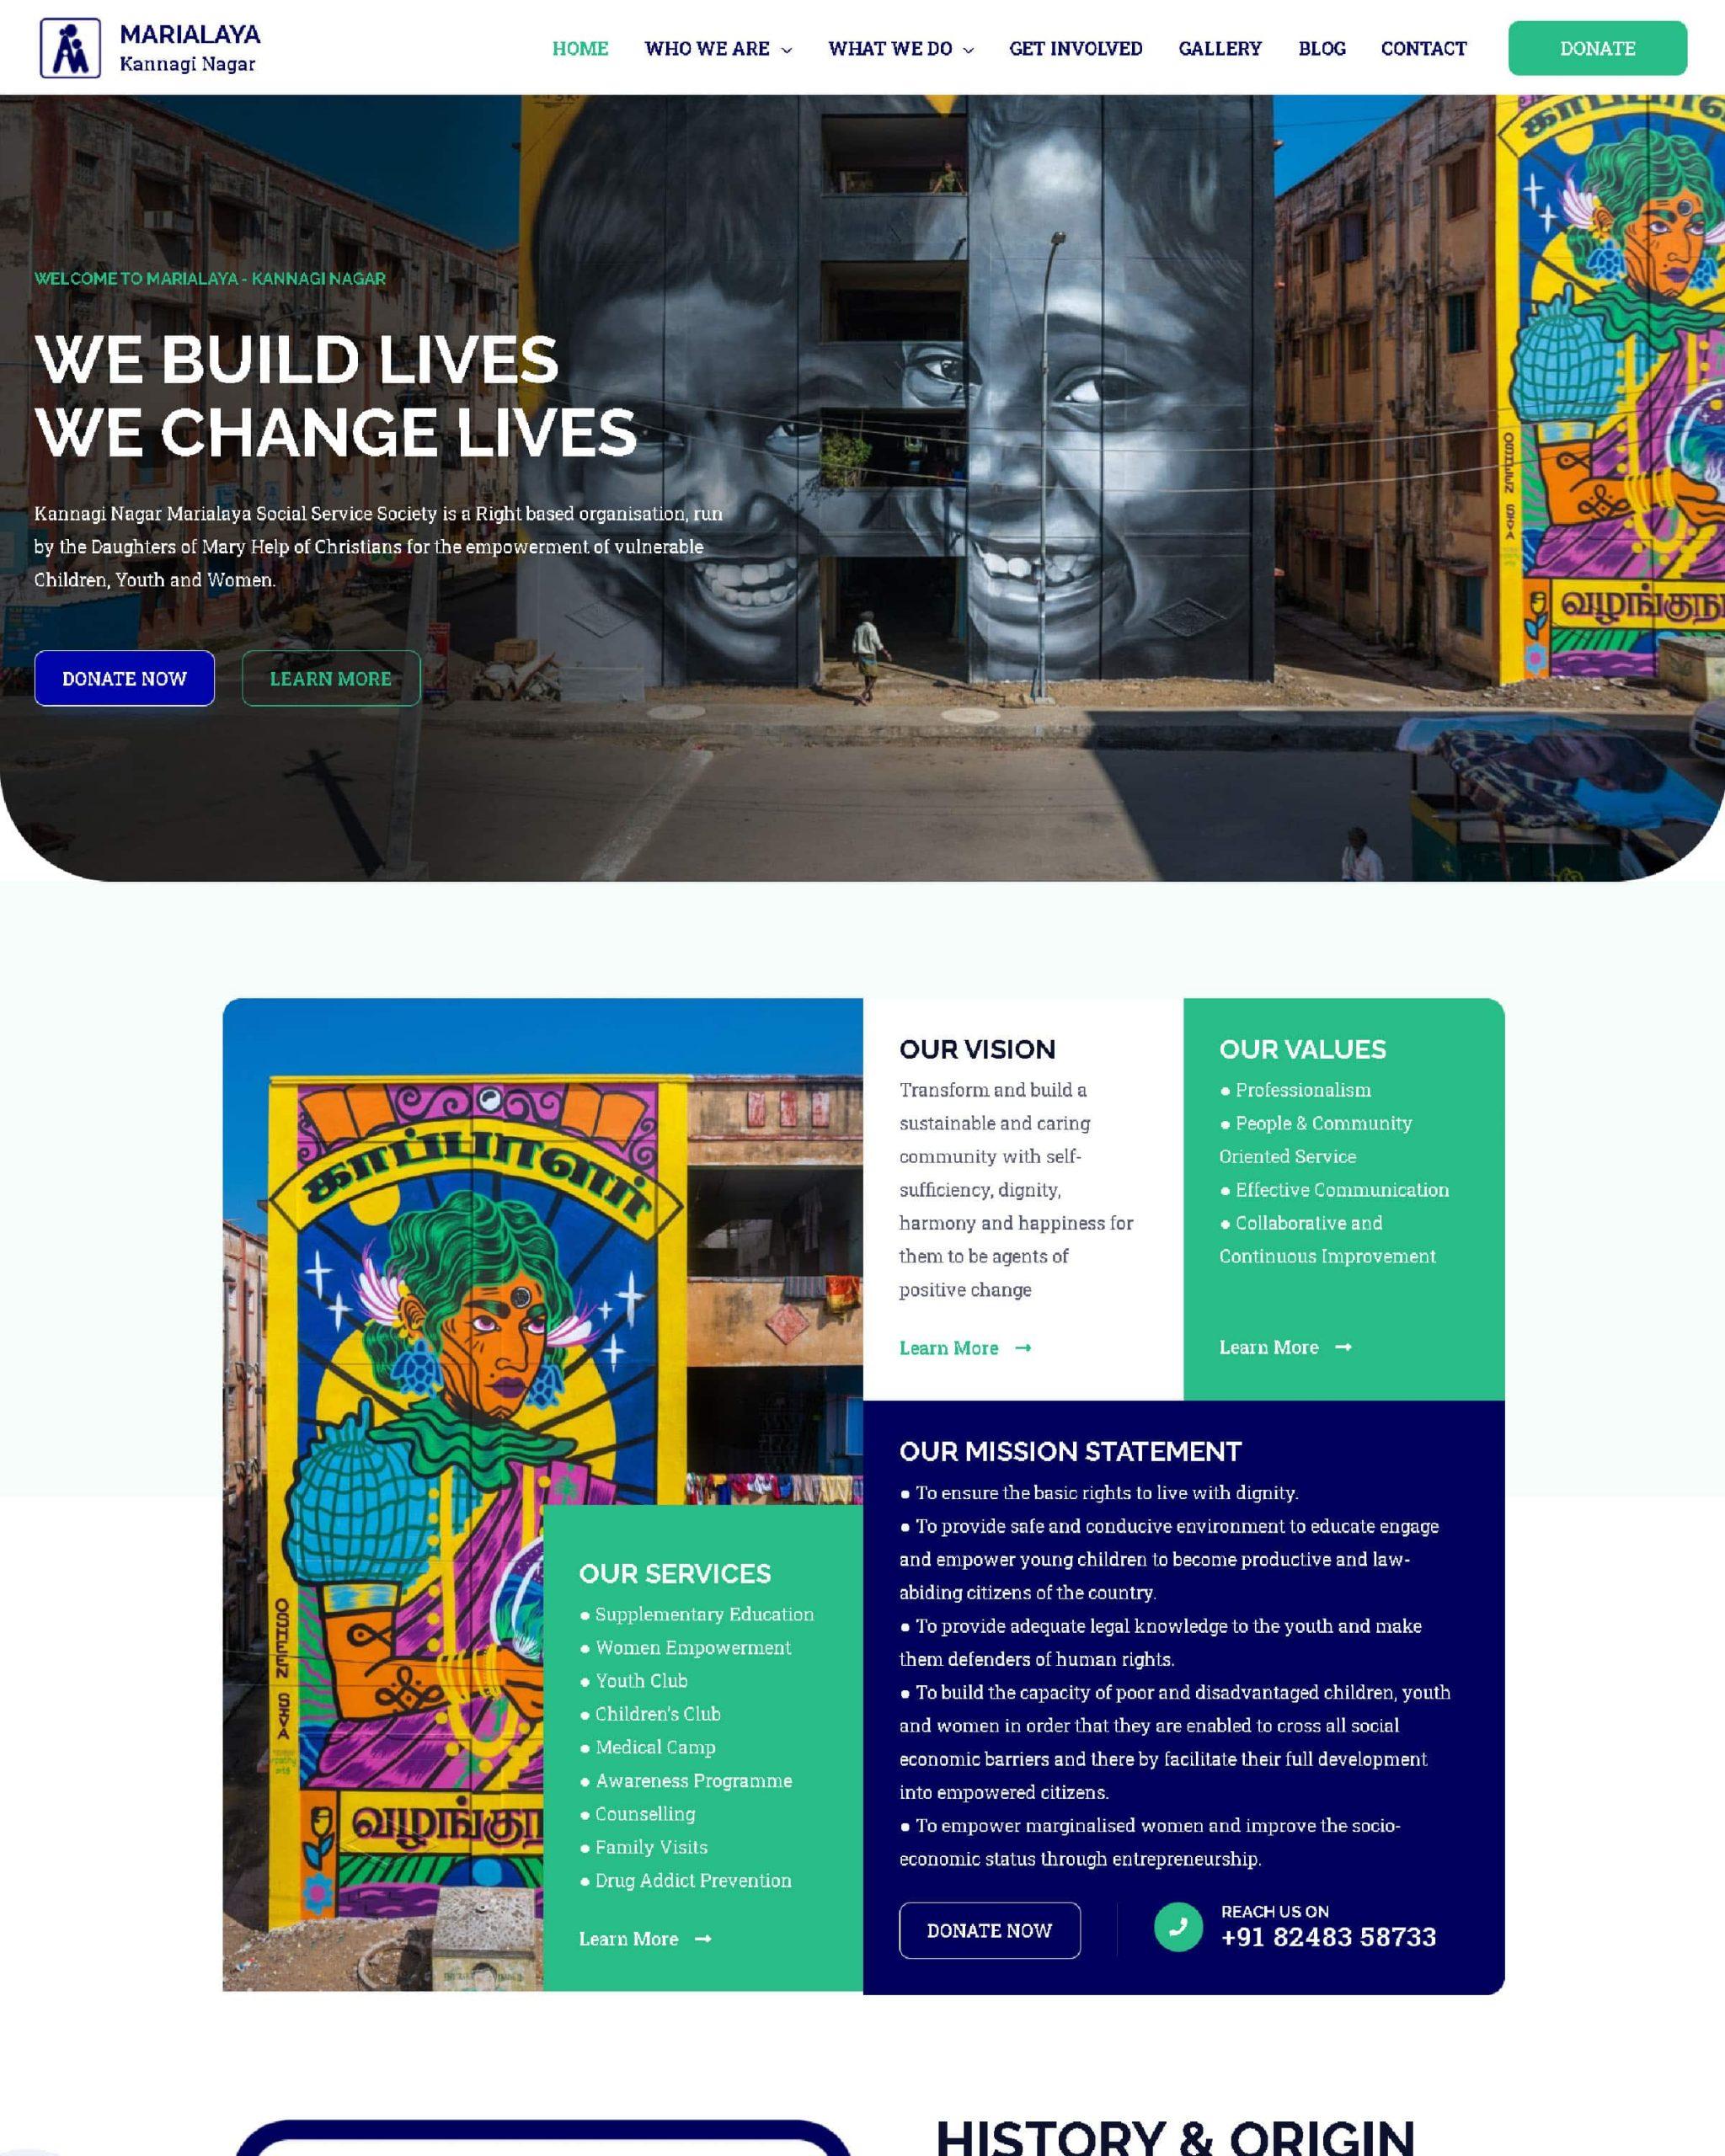 panfila™ global solutions marialaya kannagi nagar